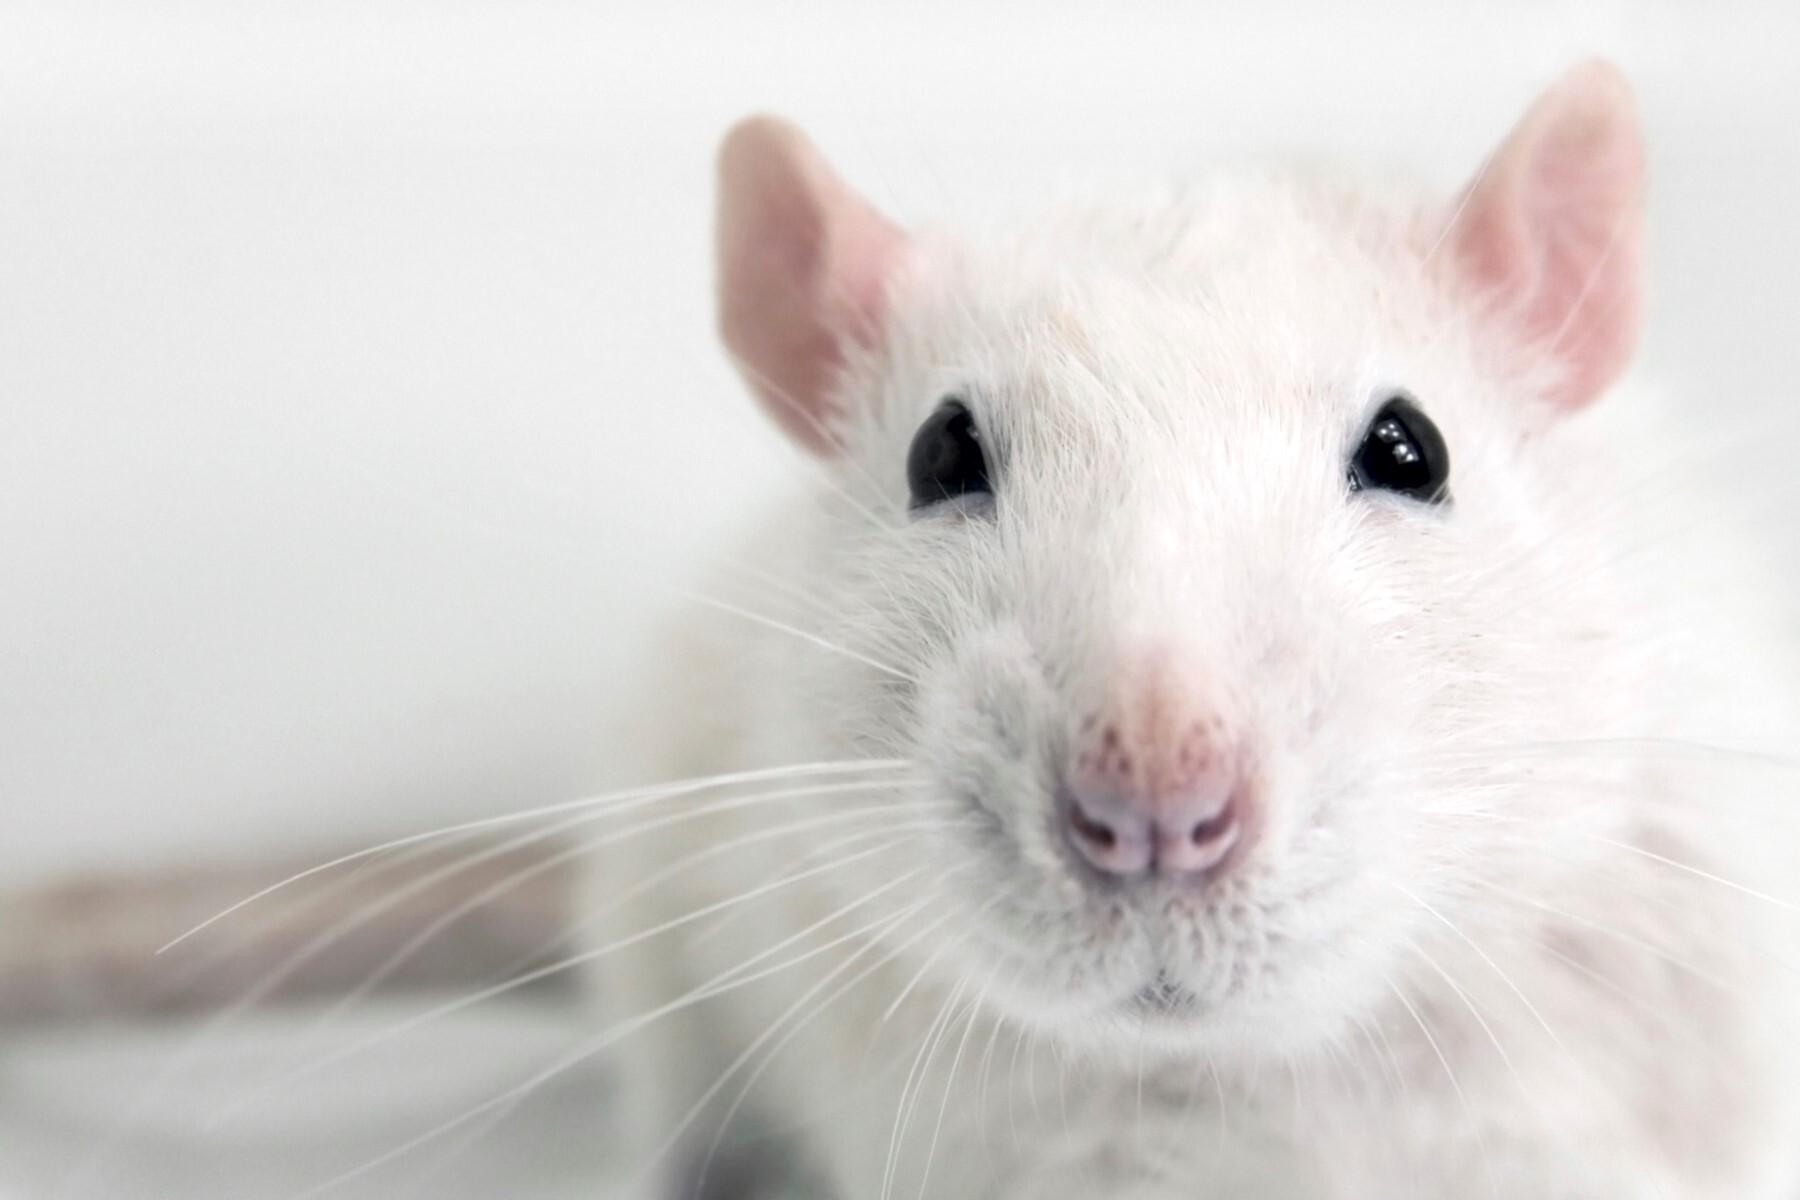 Animal White Mouse Face Closeup HD Wallpaper